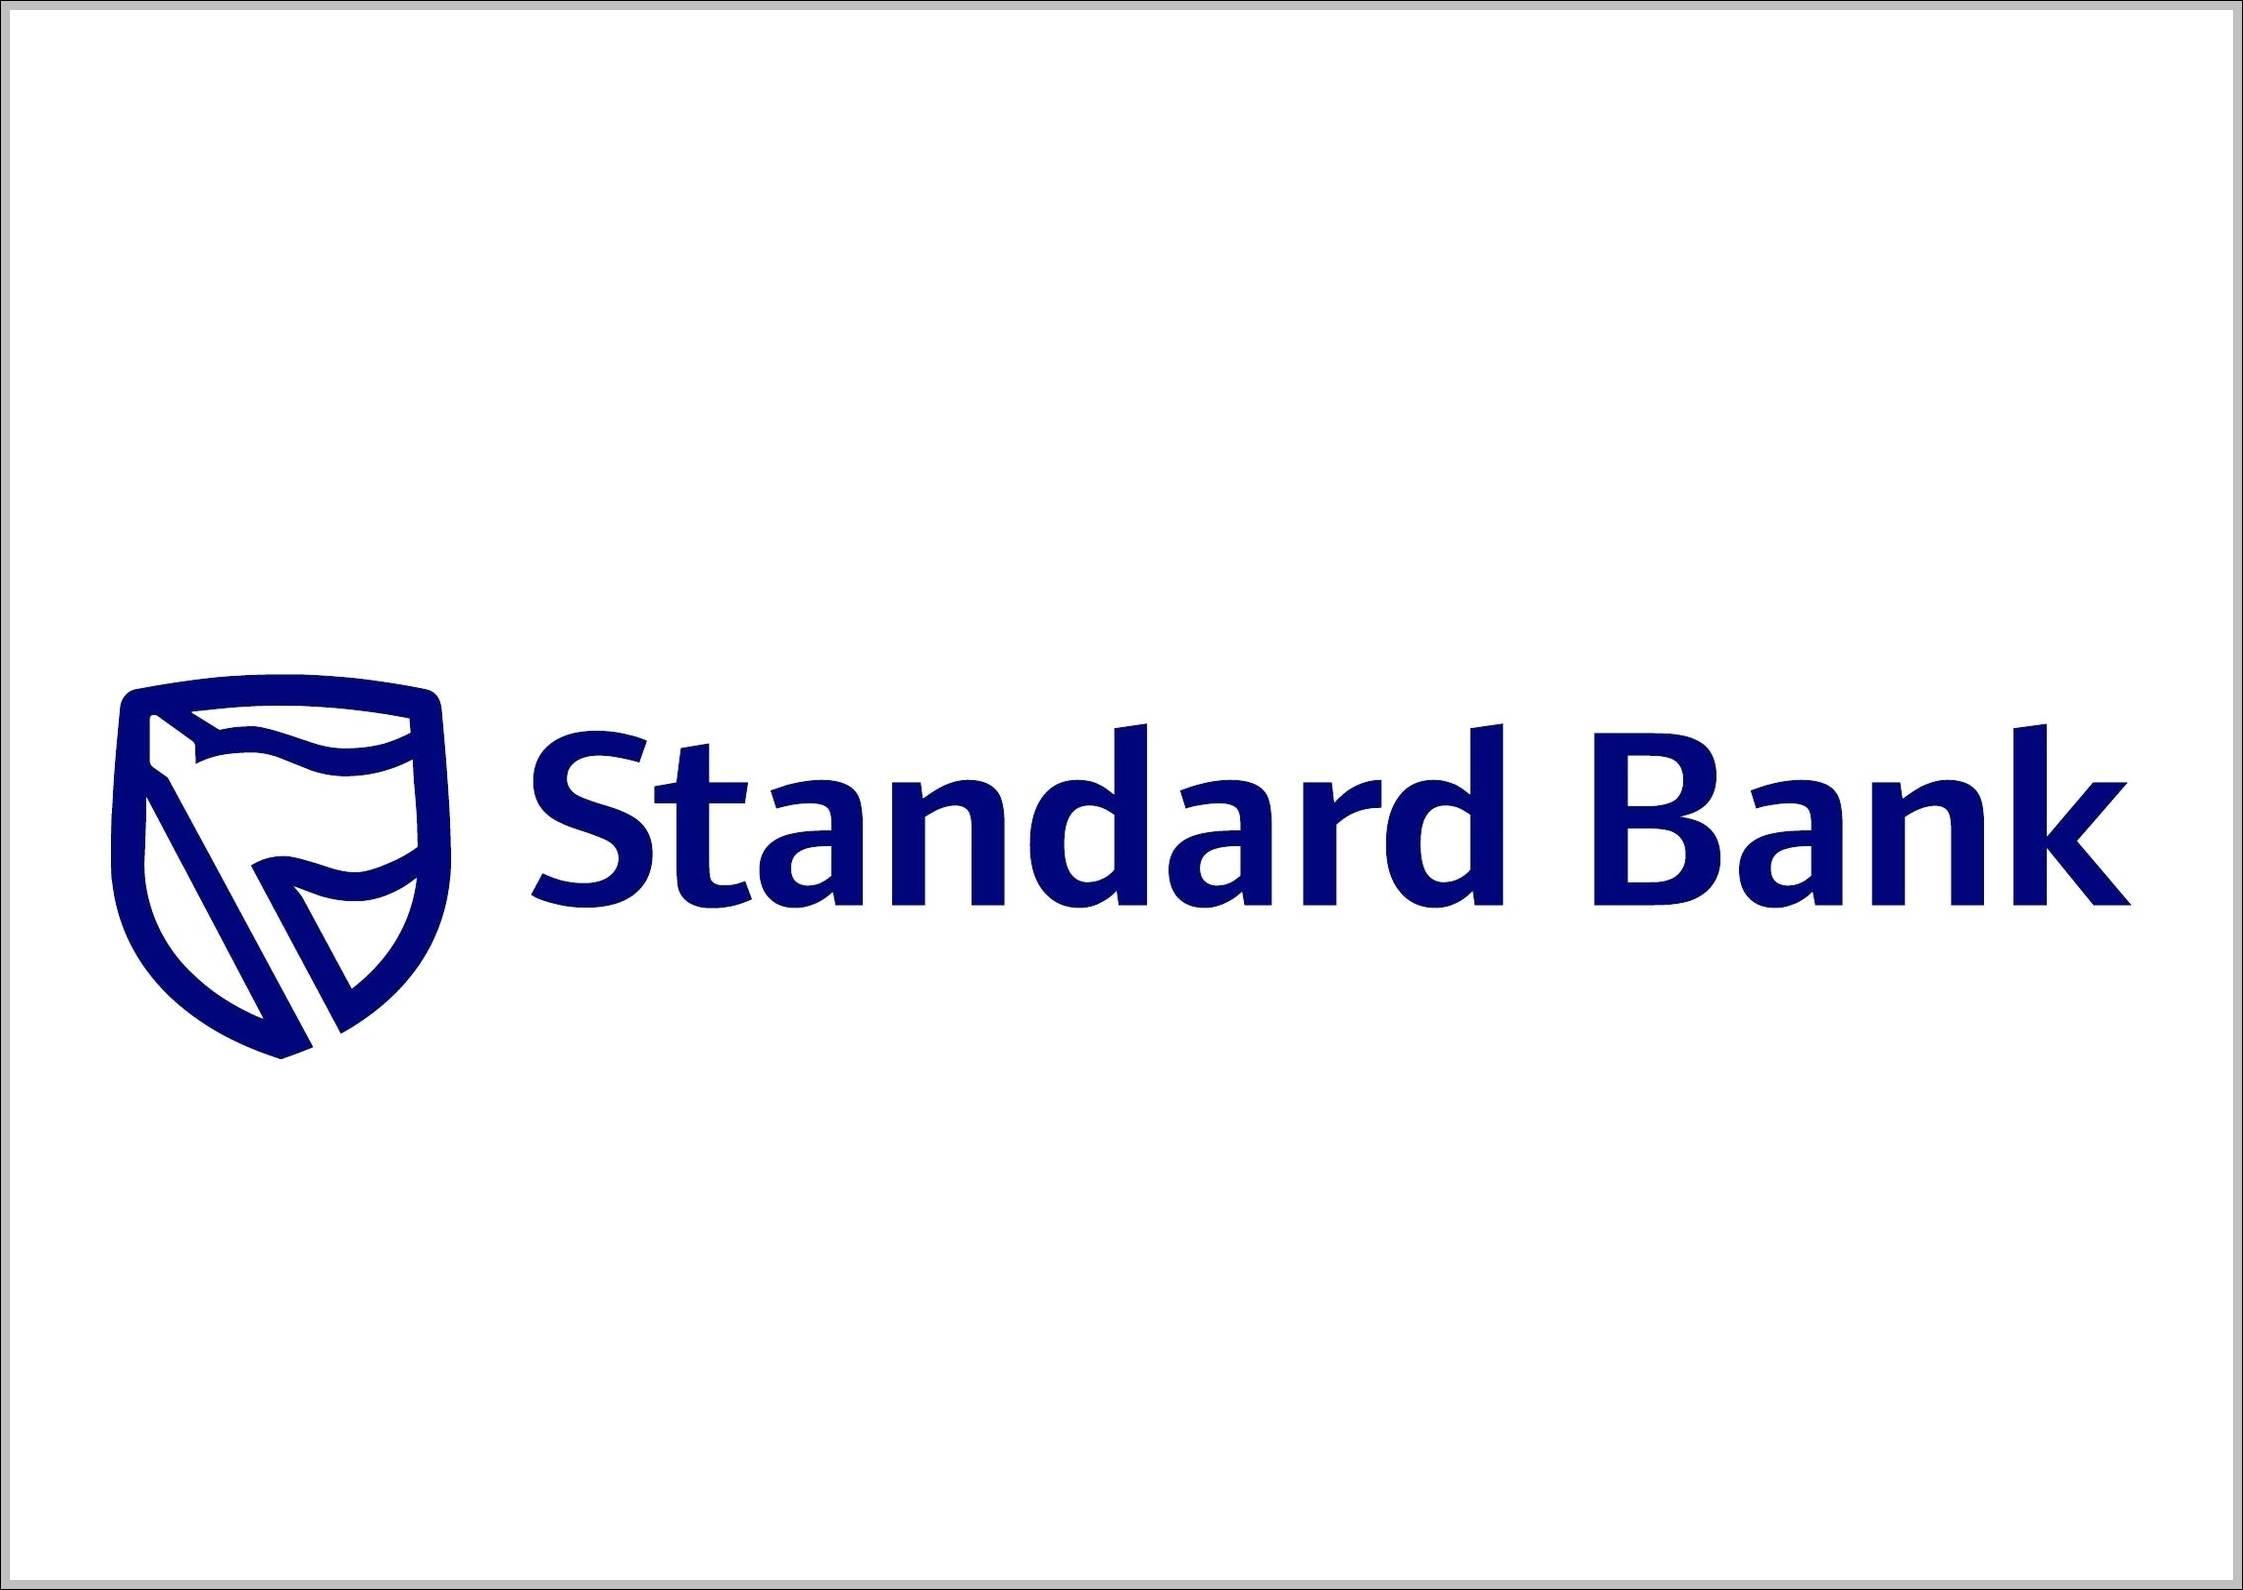 Standard Bank sign